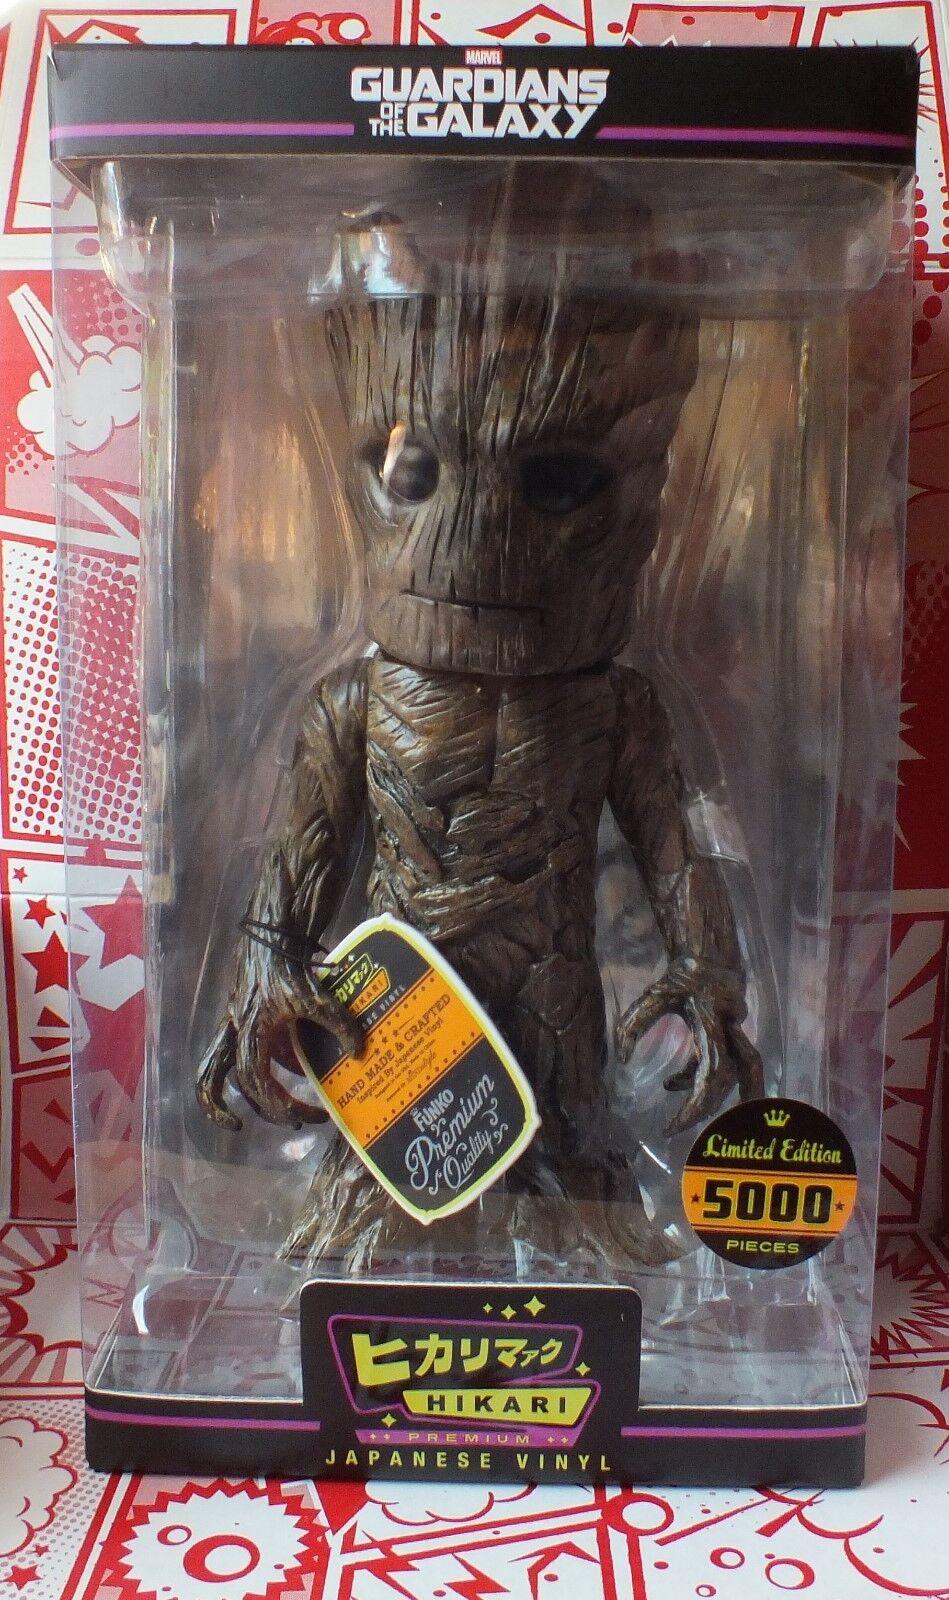 Guardians of the Galaxy Groot Hikari Premium Sofubi Figura in vinile-Ltd5000